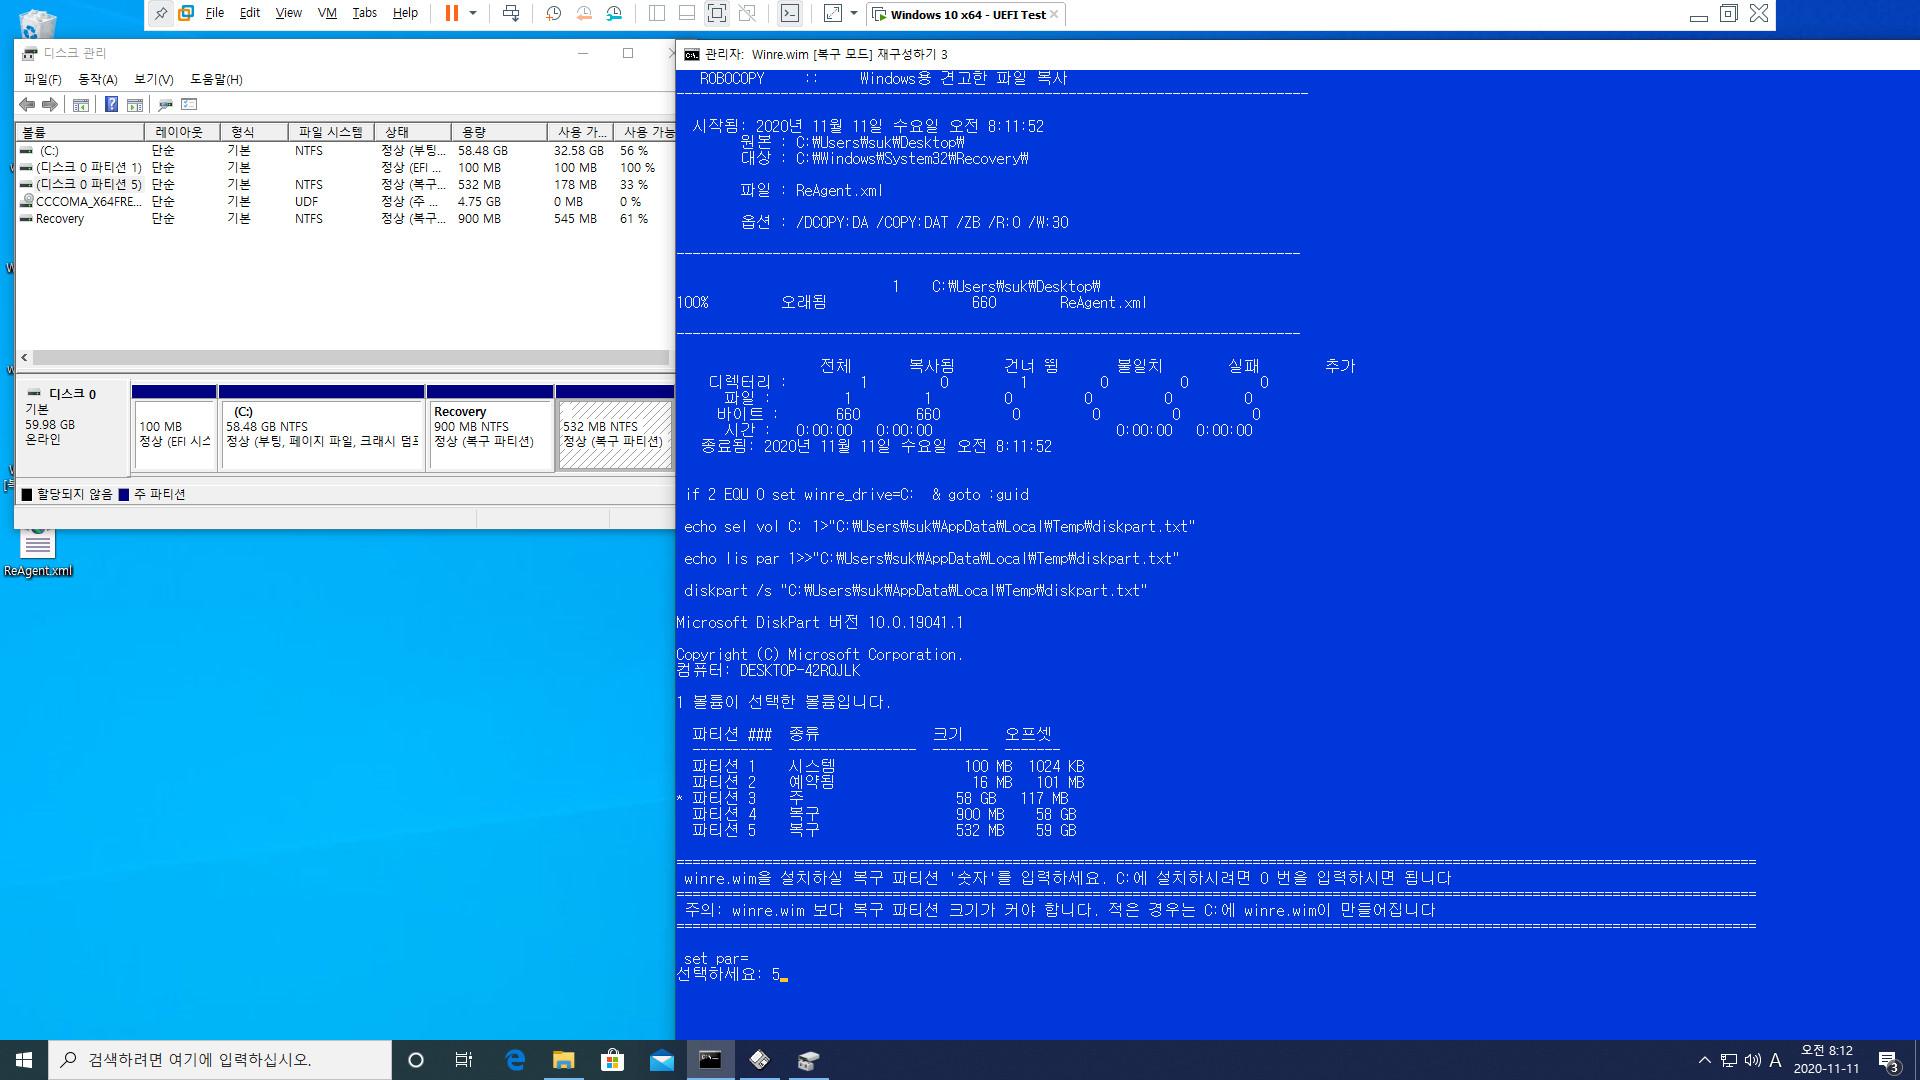 Winre.wim [복구 모드] 재구성하기 3 - 복구파티션 포함 [2020-11-11].bat 테스트 2020-11-11_081248.jpg